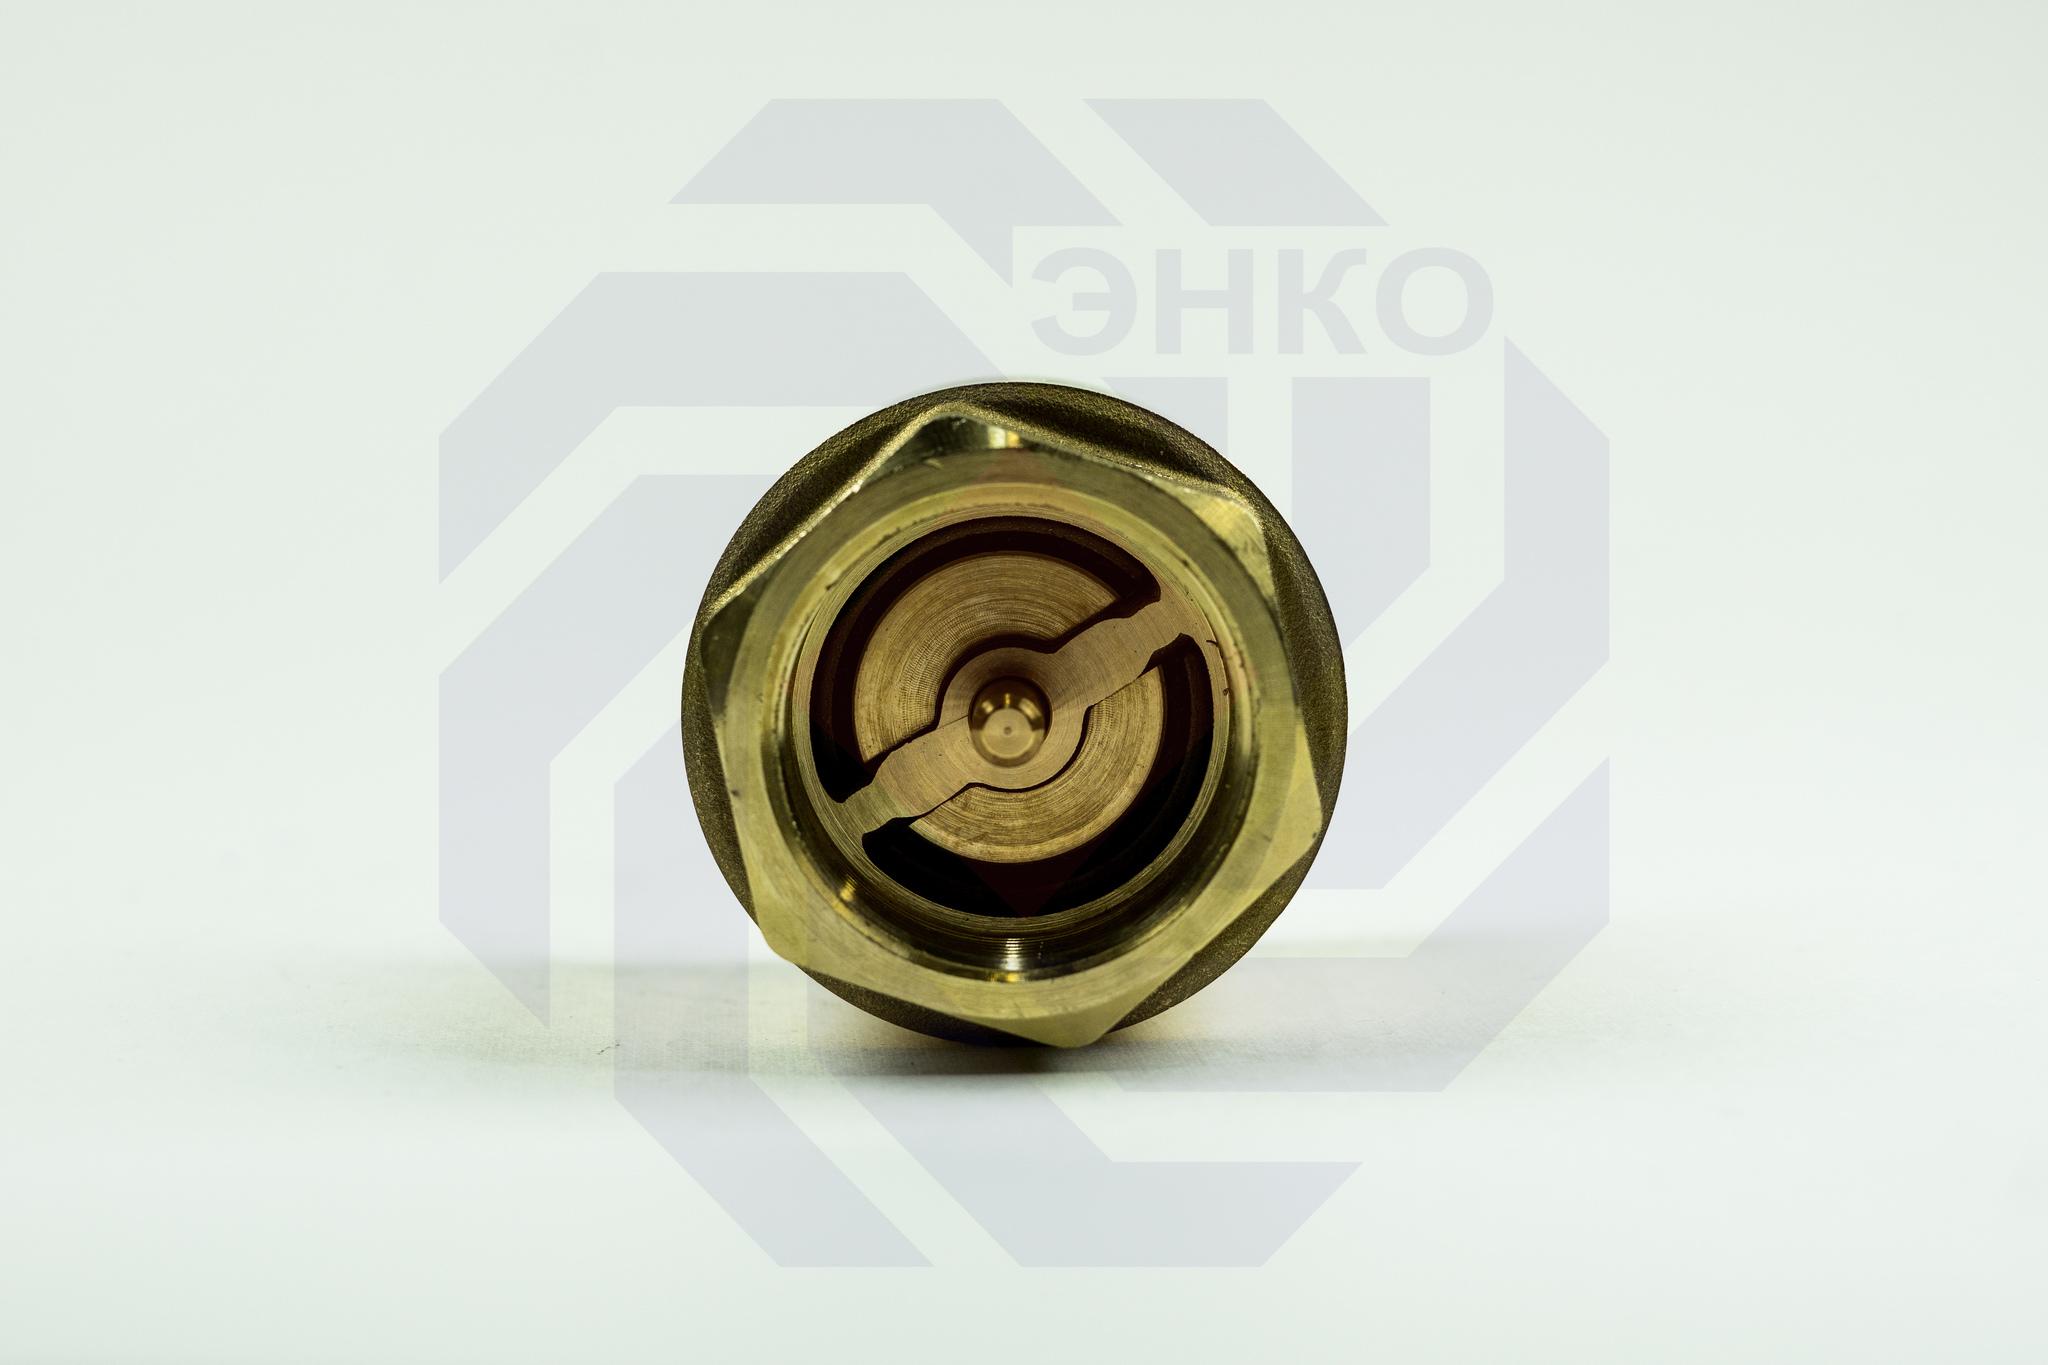 Клапан обратный ВР/ВР BUGATTI EURO 2000 1¼